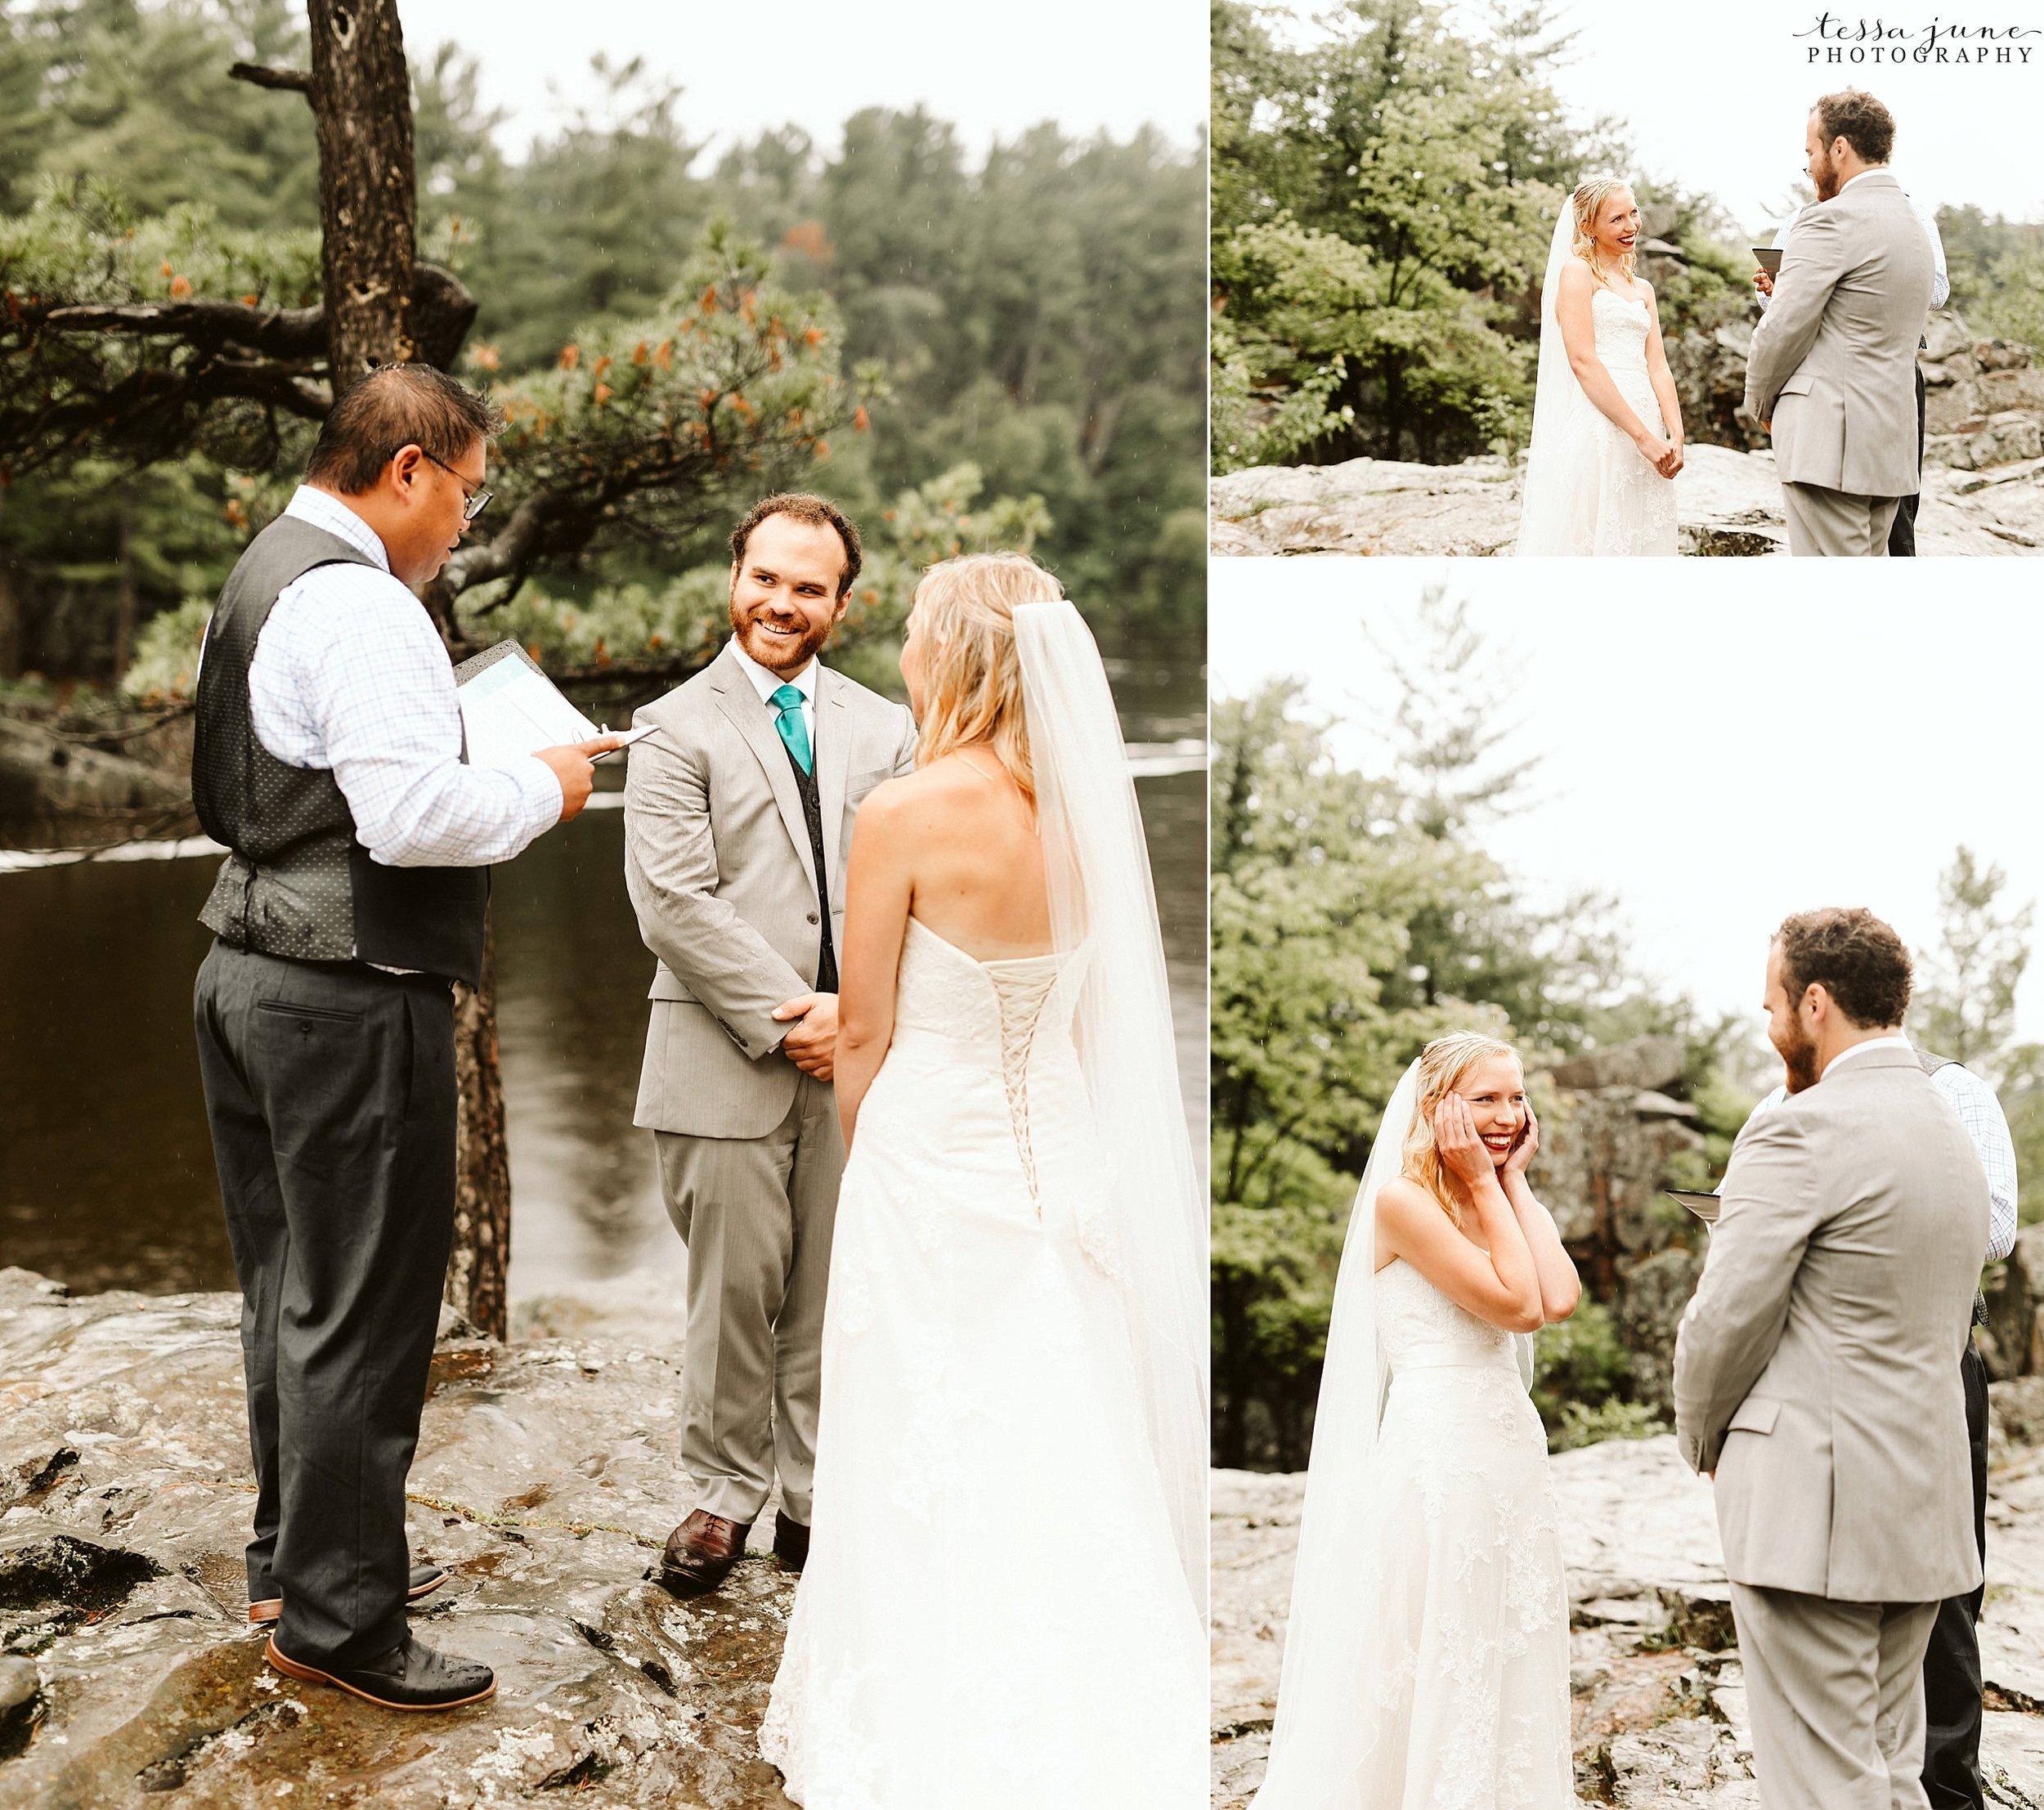 taylors-falls-rainy-elopement-wedding-interstate-state-park-54.jpg